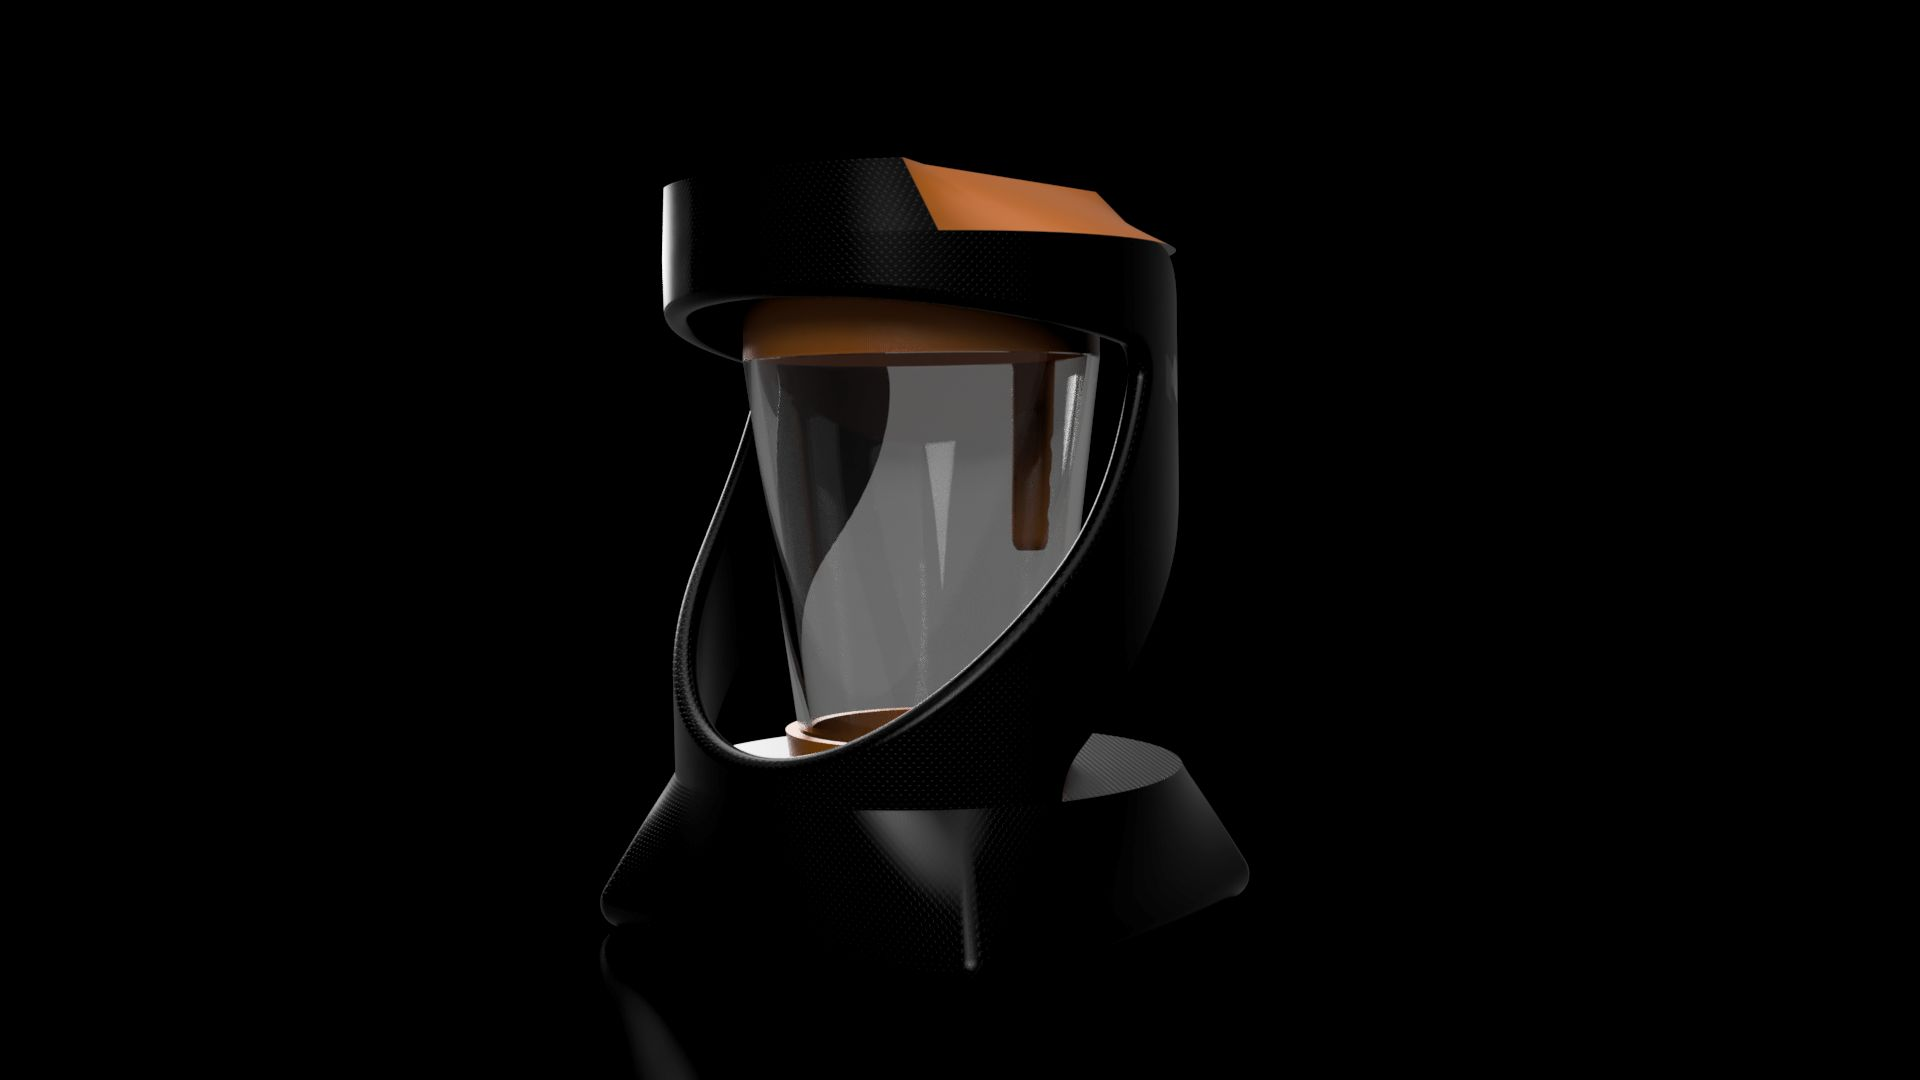 Liq-design-lcs2018-fabrica-de-nerdes-7-3500-3500